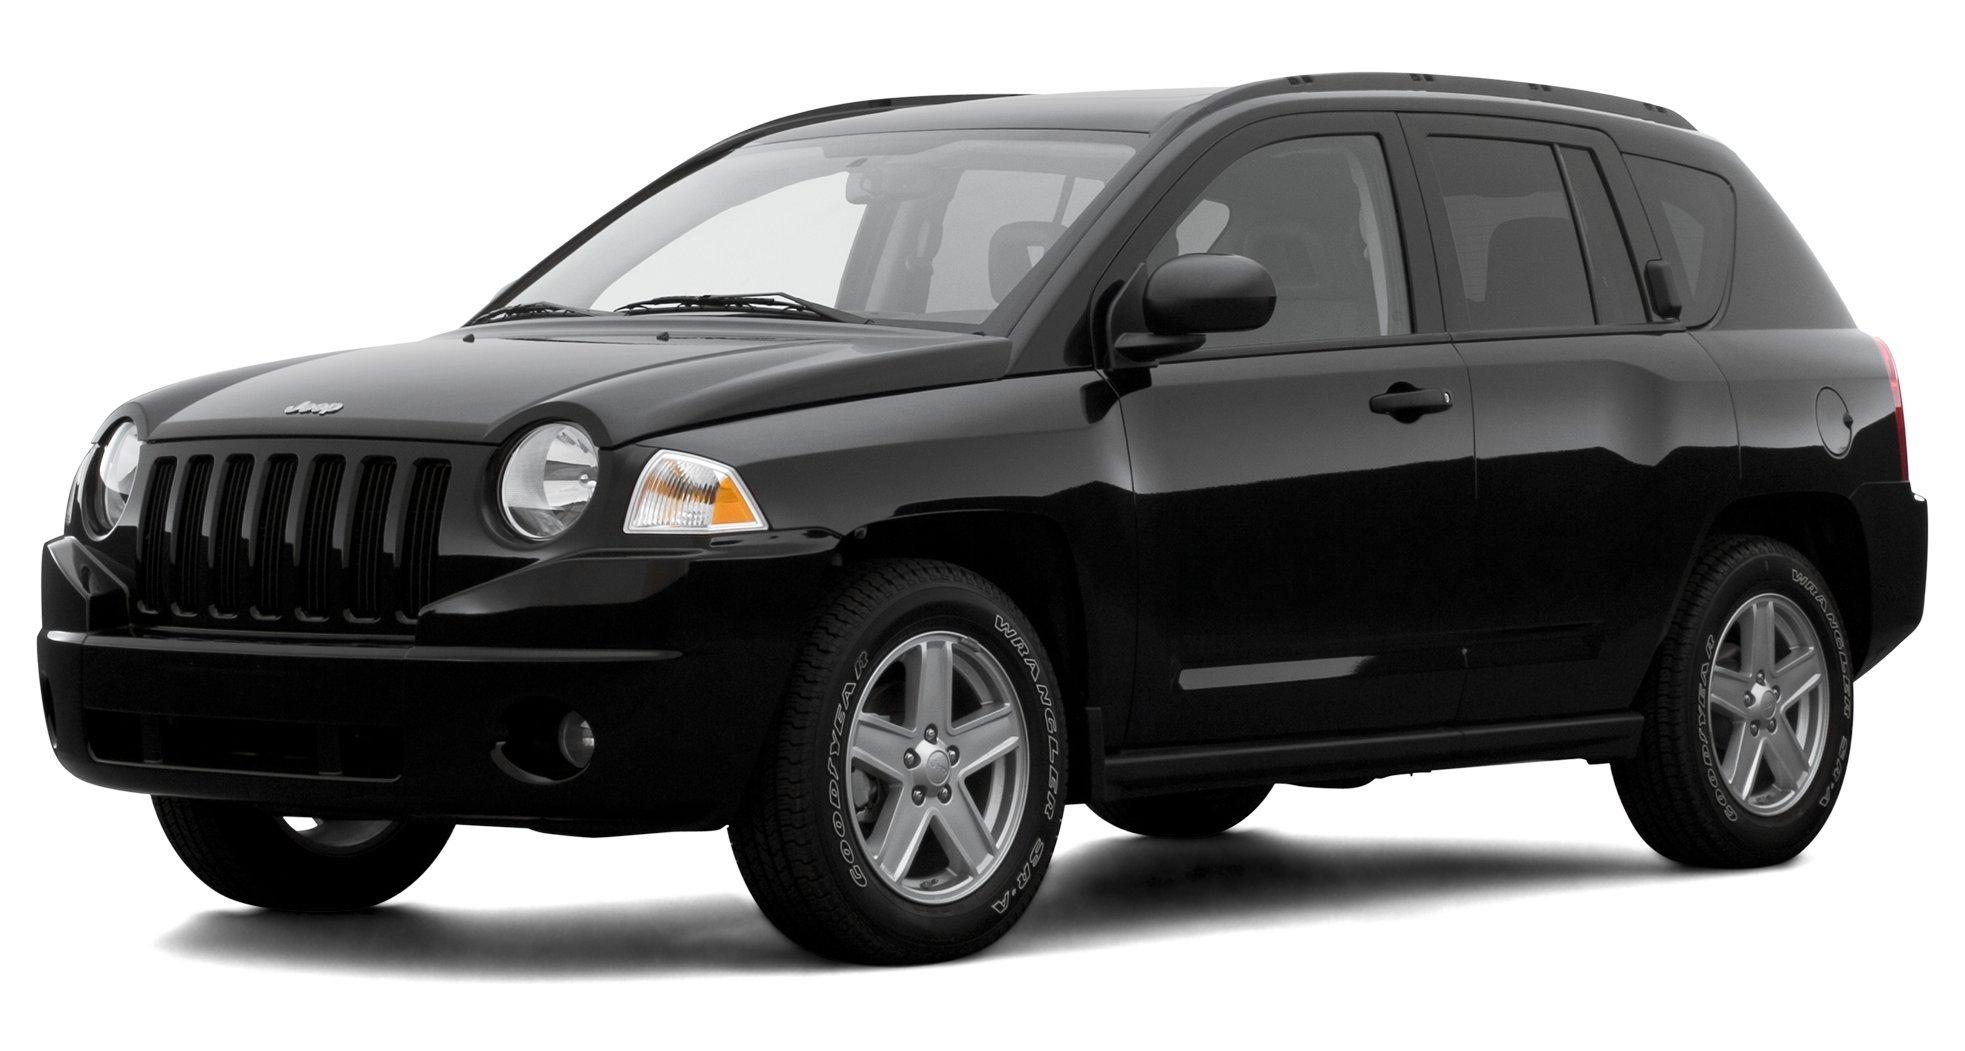 2007 jeep compass manual transmission